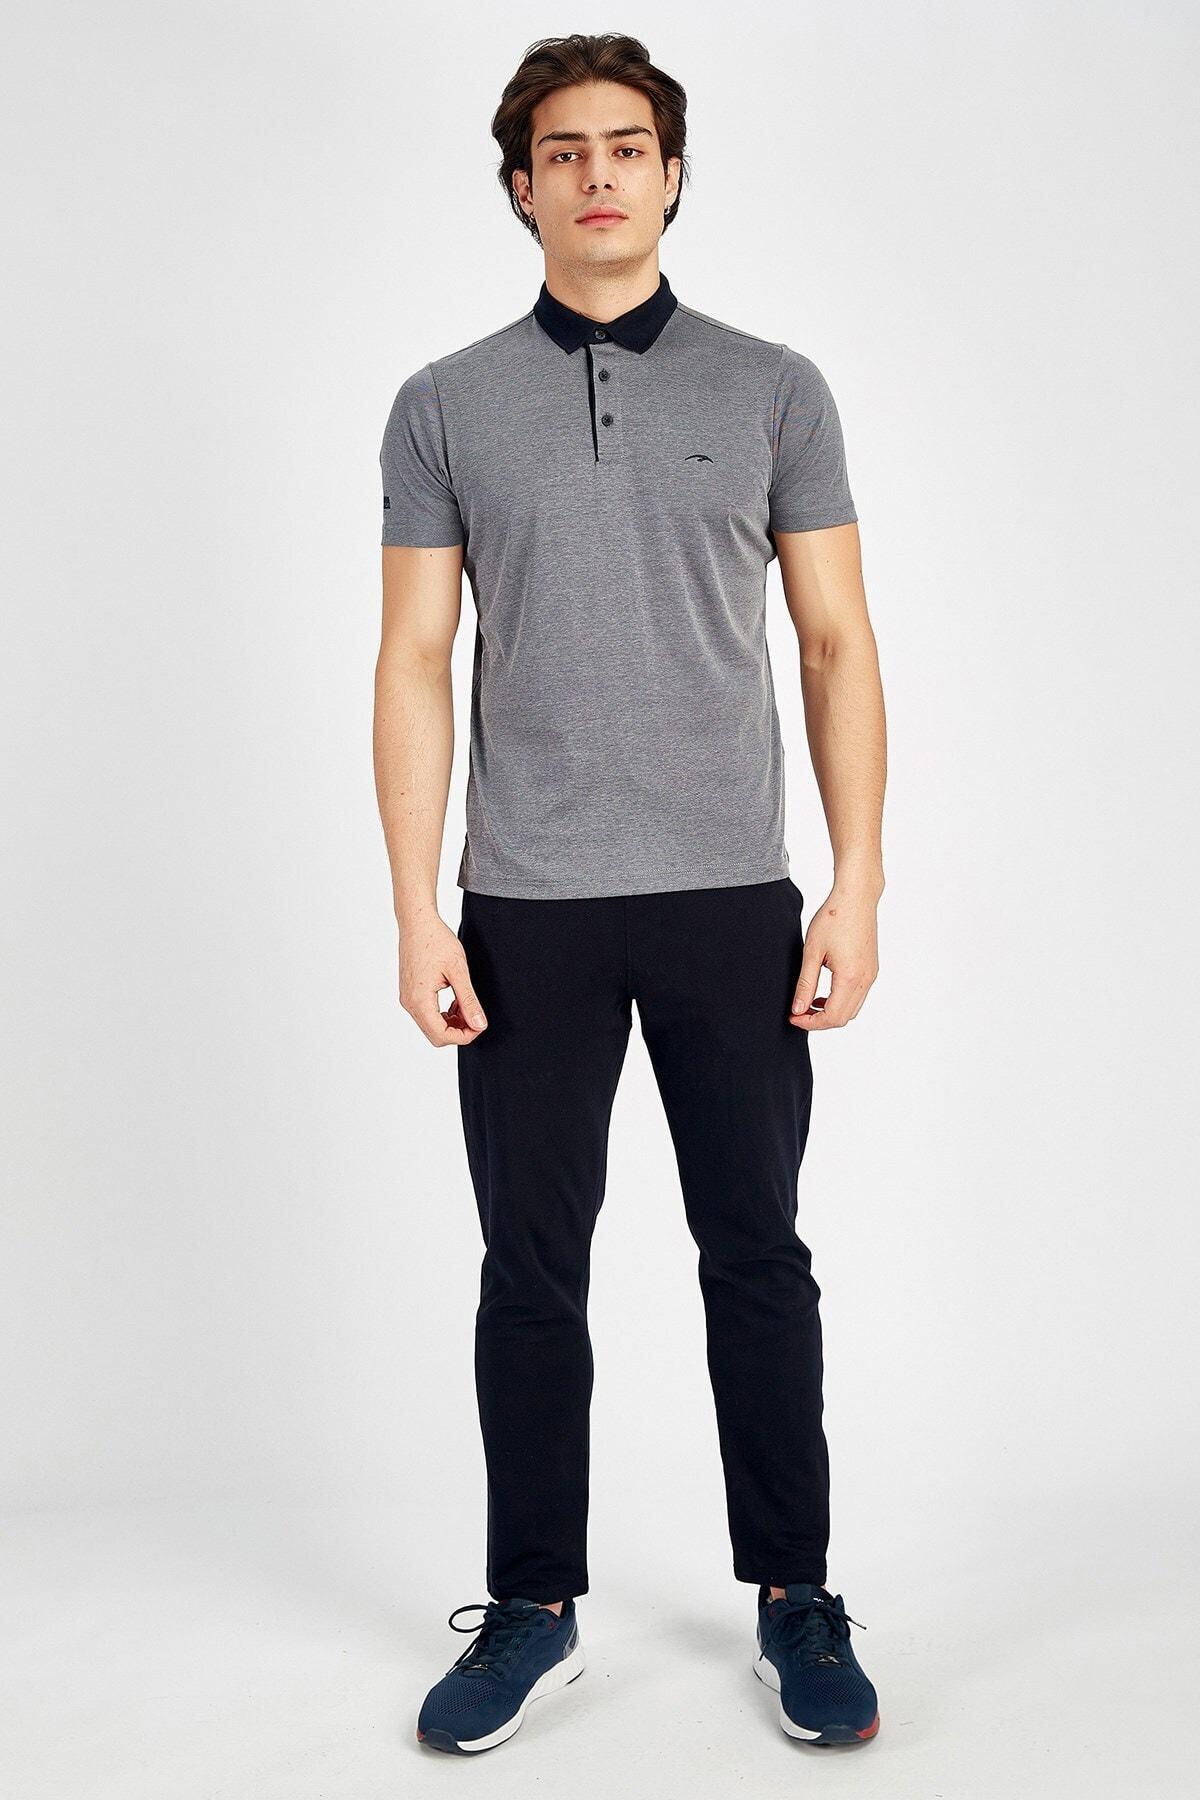 MARATON Erkek Gri Sportswear T-shirt 1